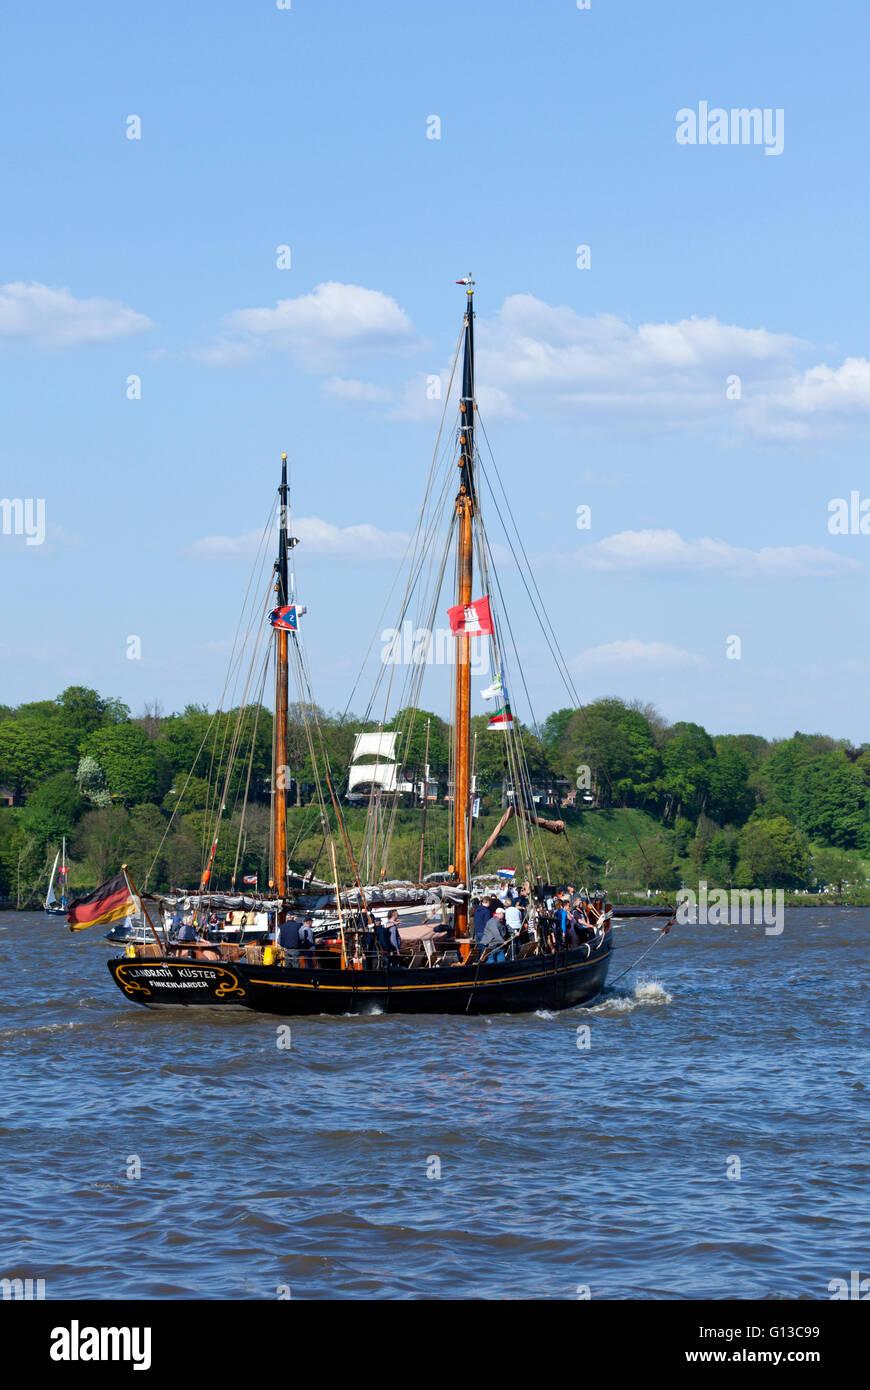 Historic german sail boat 'Landrath Küster' on the Elbe river during 827th Port Anniversary, Hamburg, - Stock Image